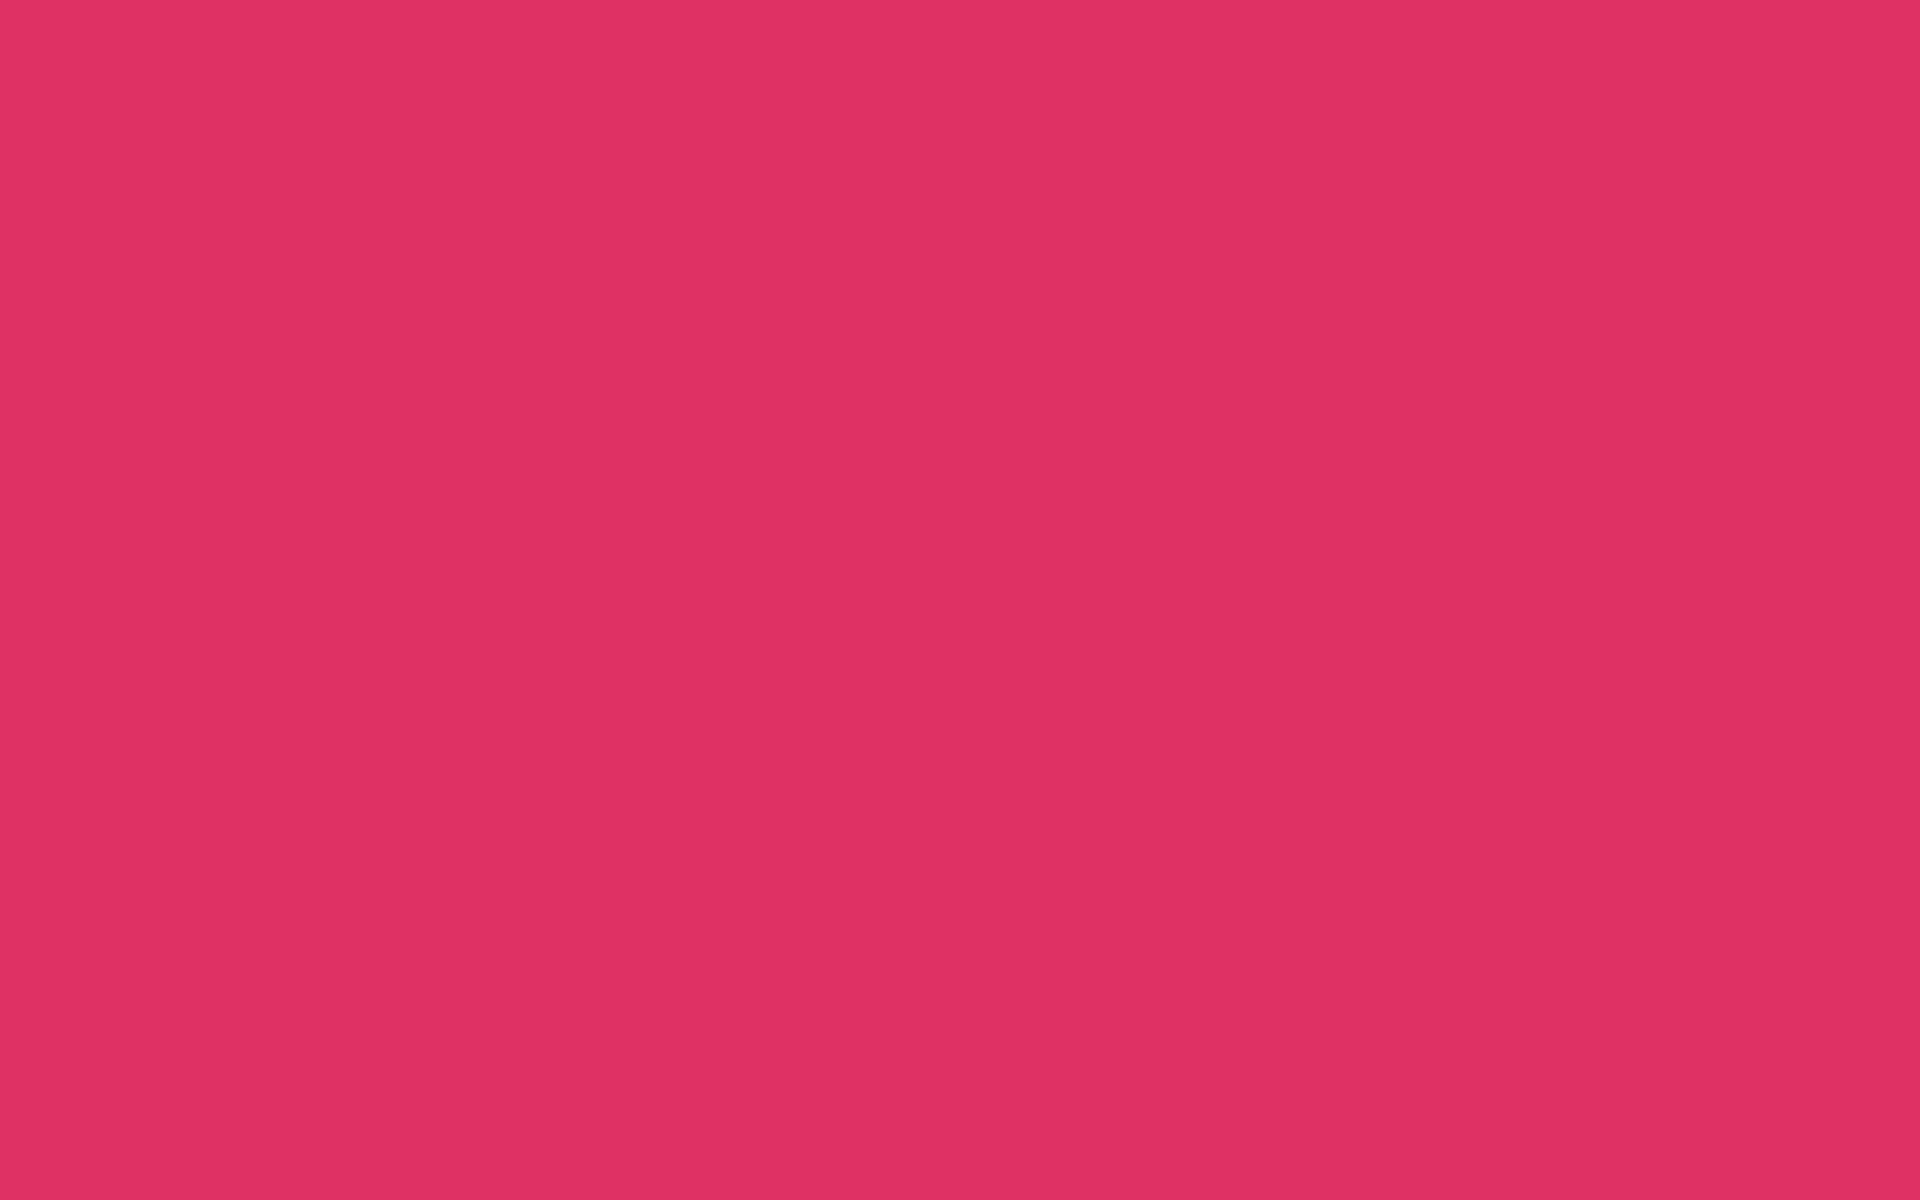 1920x1200 Cerise Solid Color Background